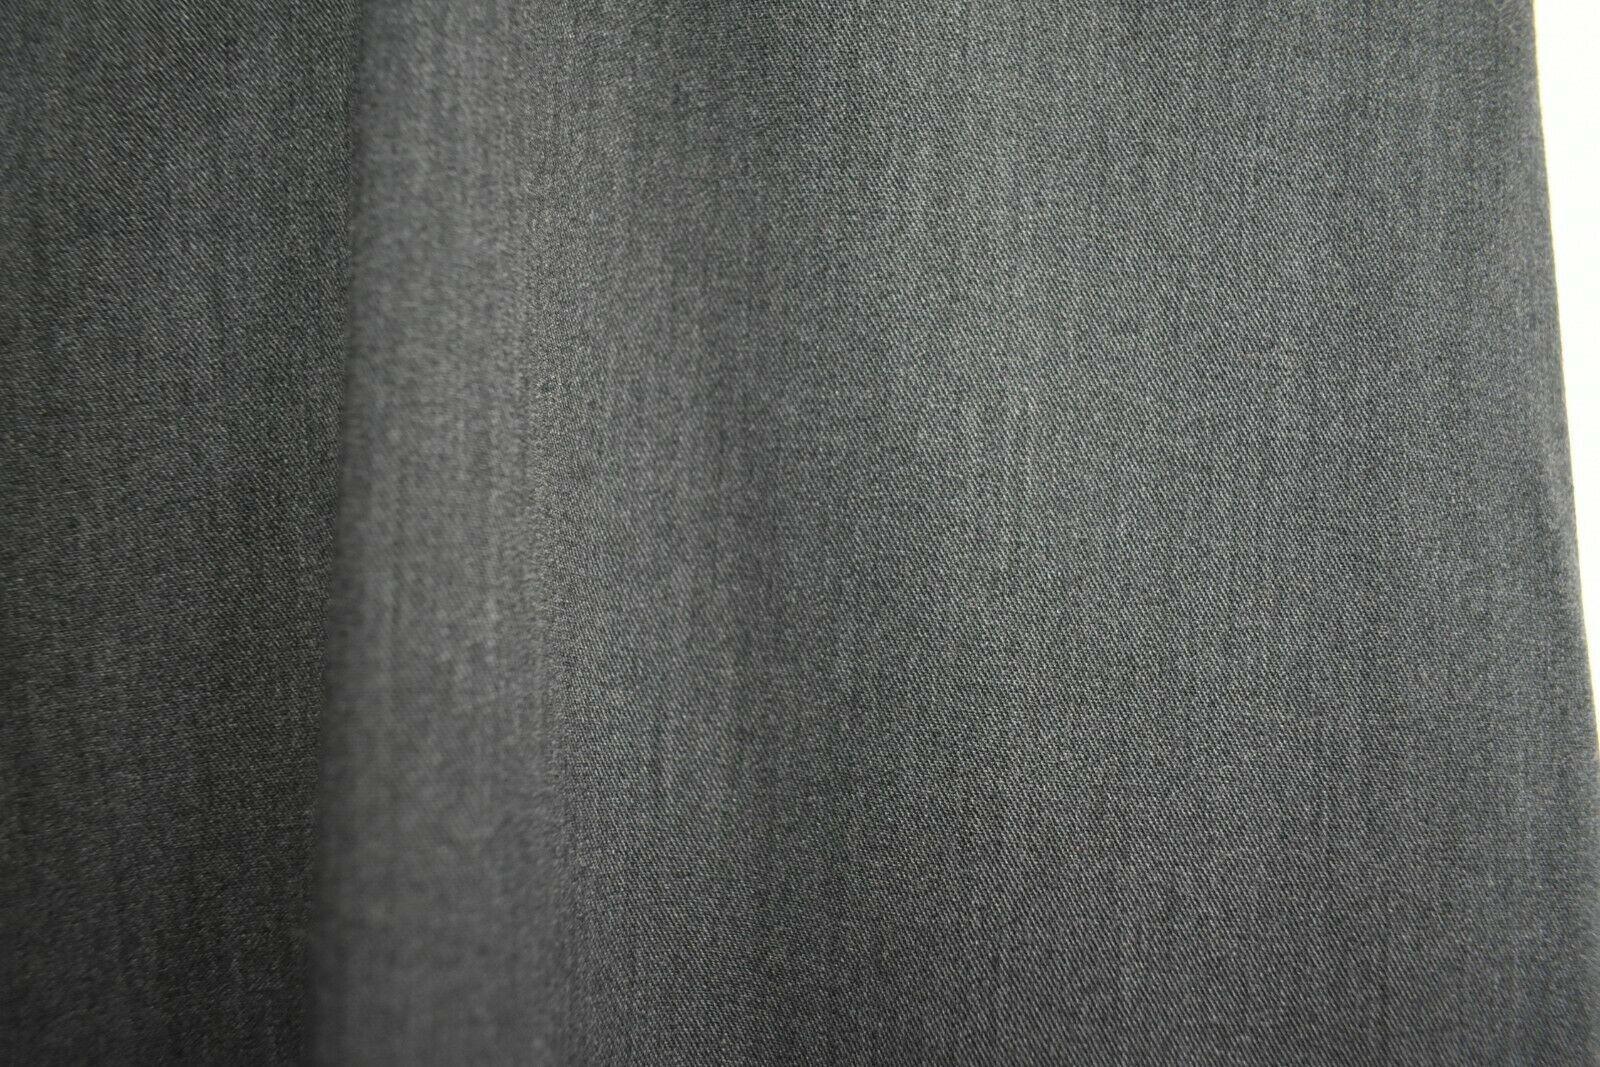 Liz Claiborne Women's 16 Highrise Spandex Office Creer Dress Pants Slacks Gray